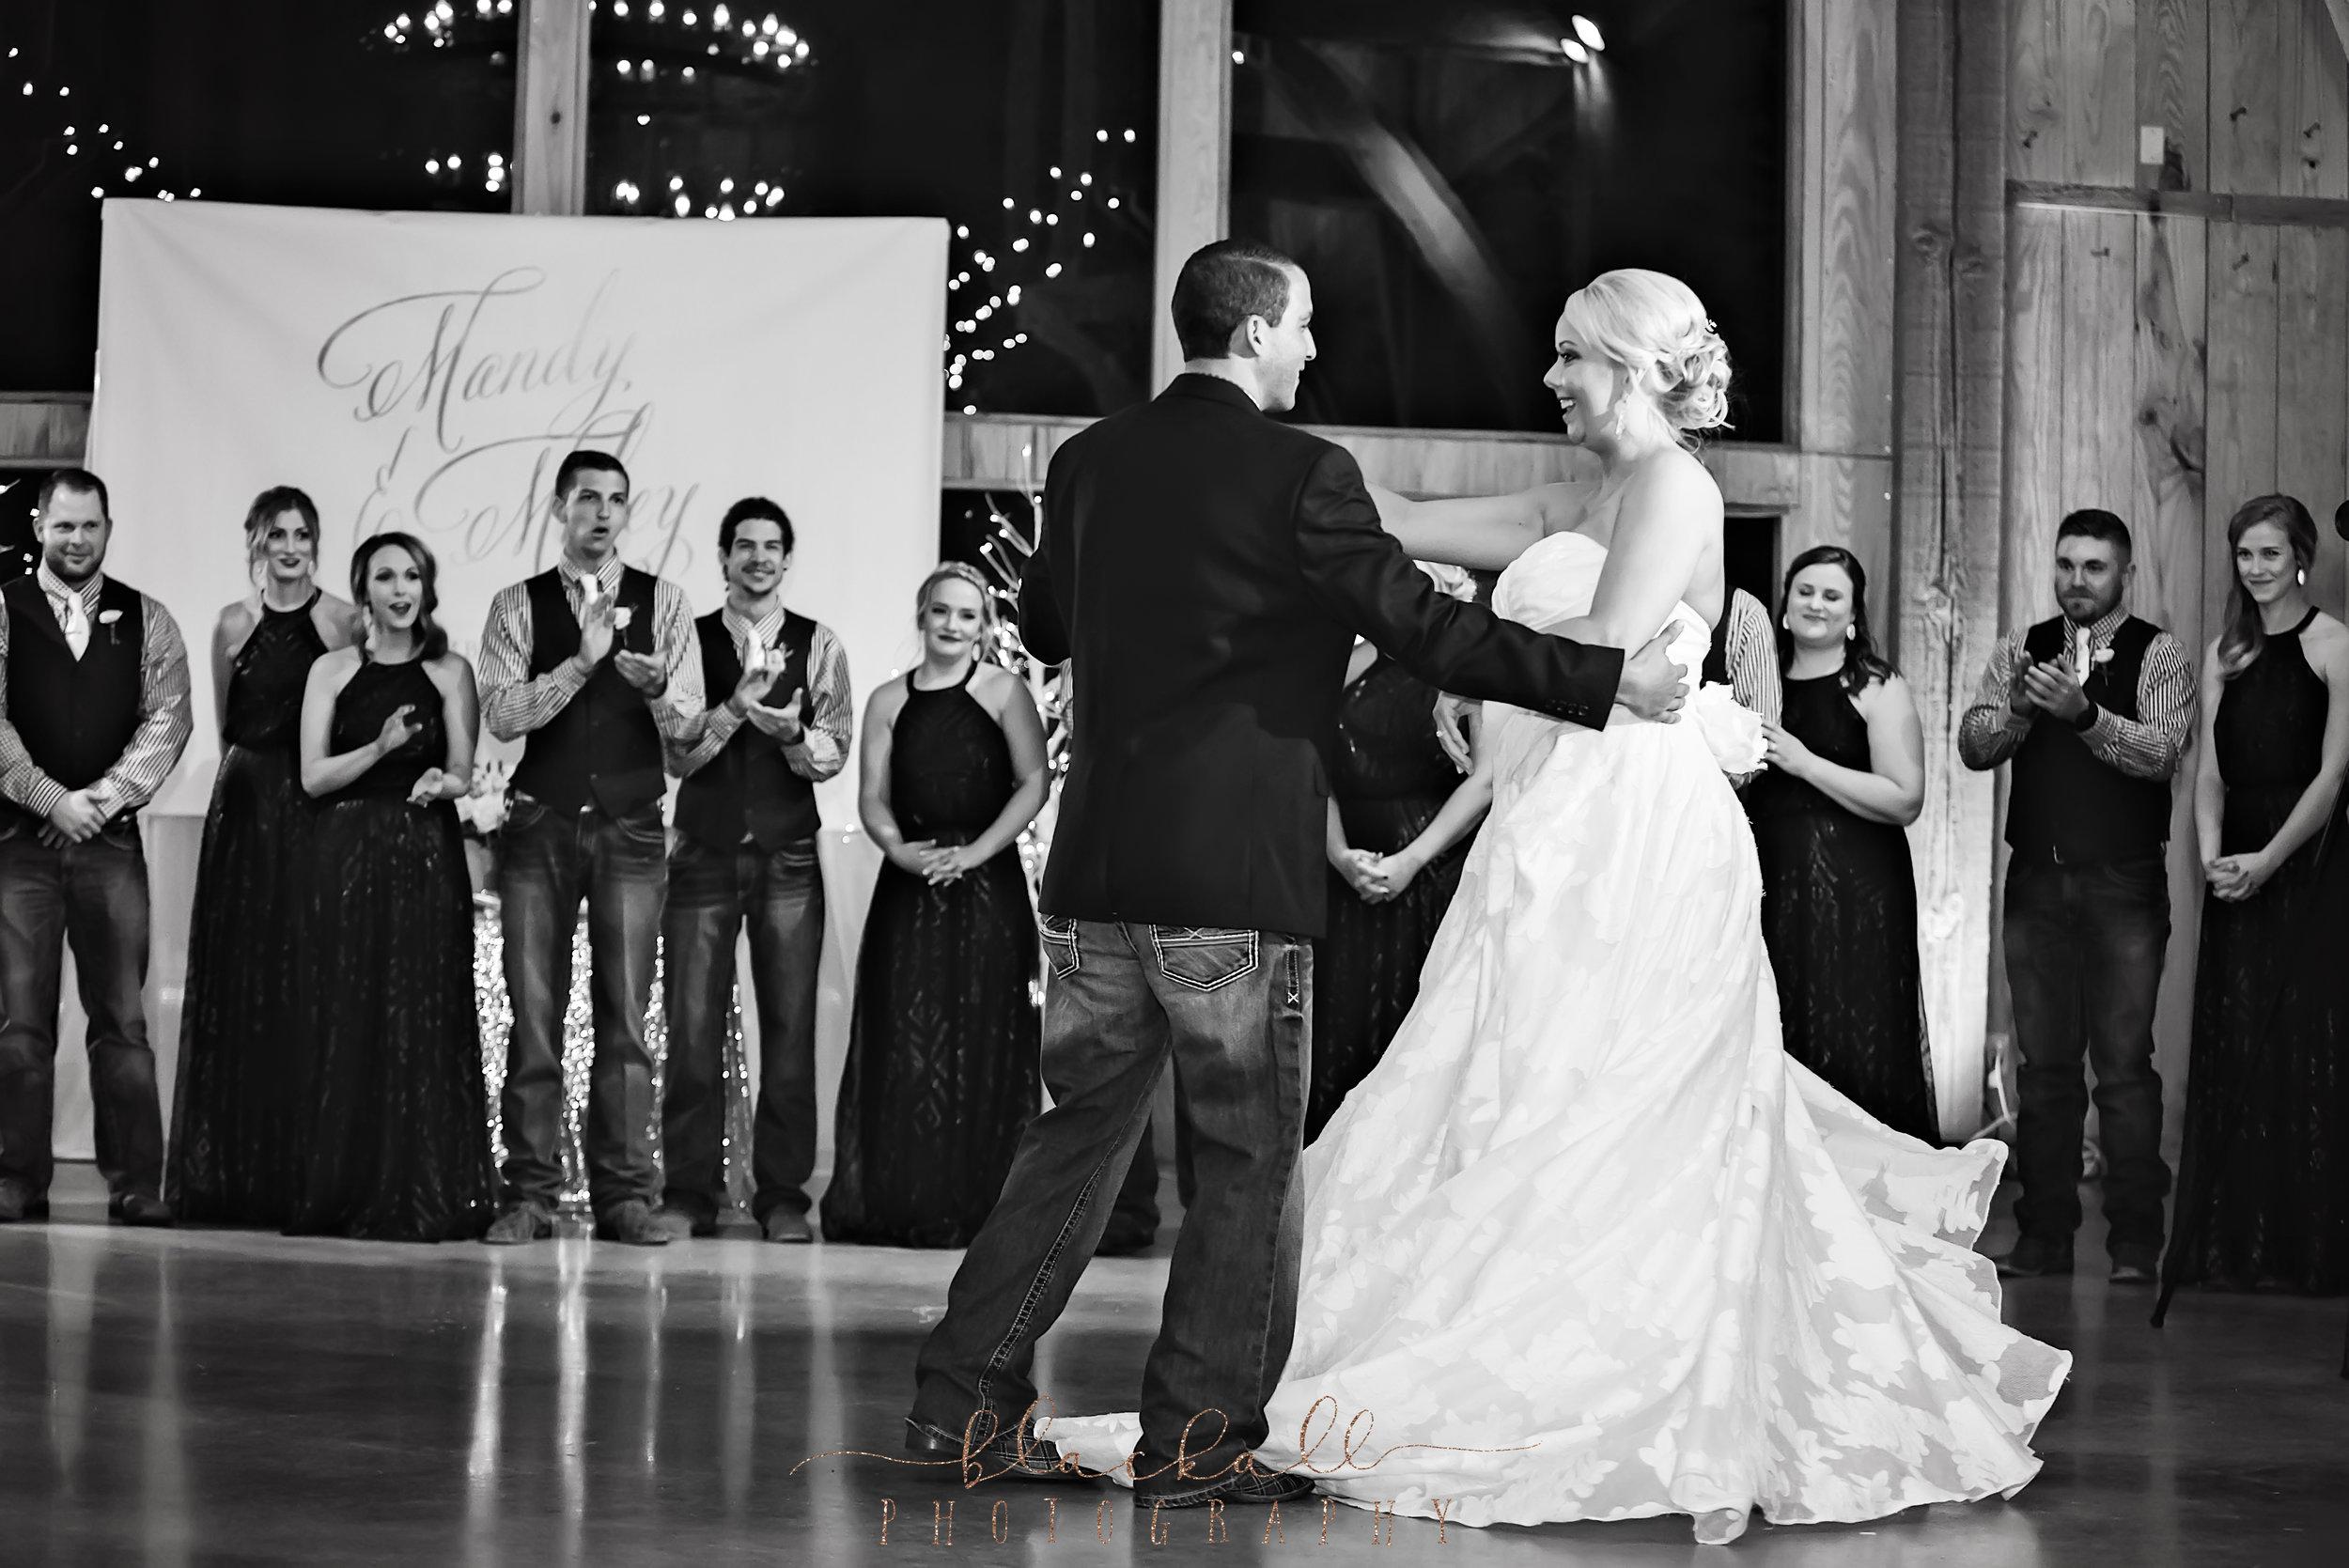 M&M WEDDING_Blackall Photography-54.JPG